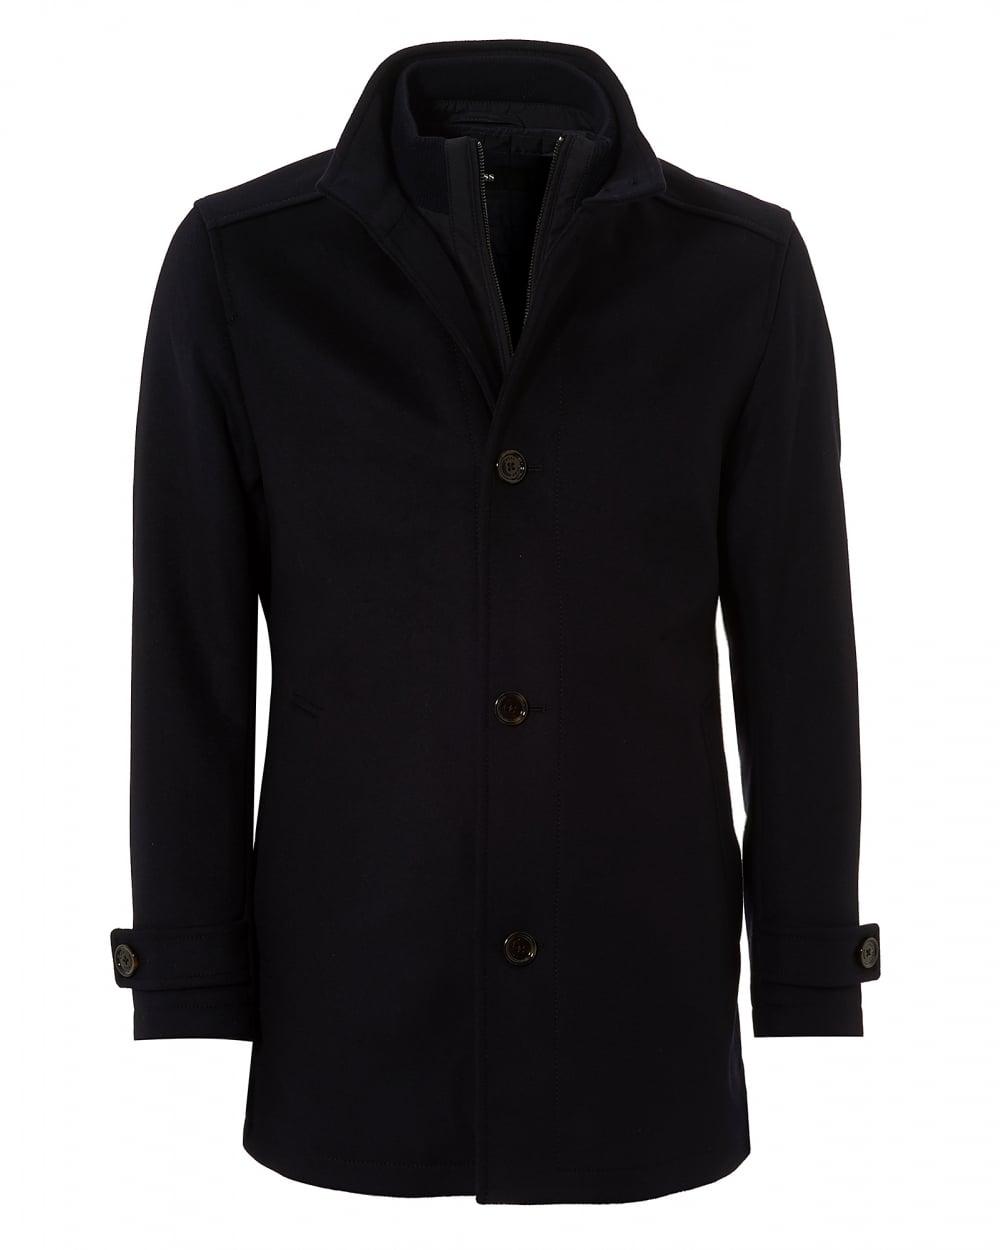 Mens Camlow Coat, Navy Blue Wool Blend Carcoat Jacket